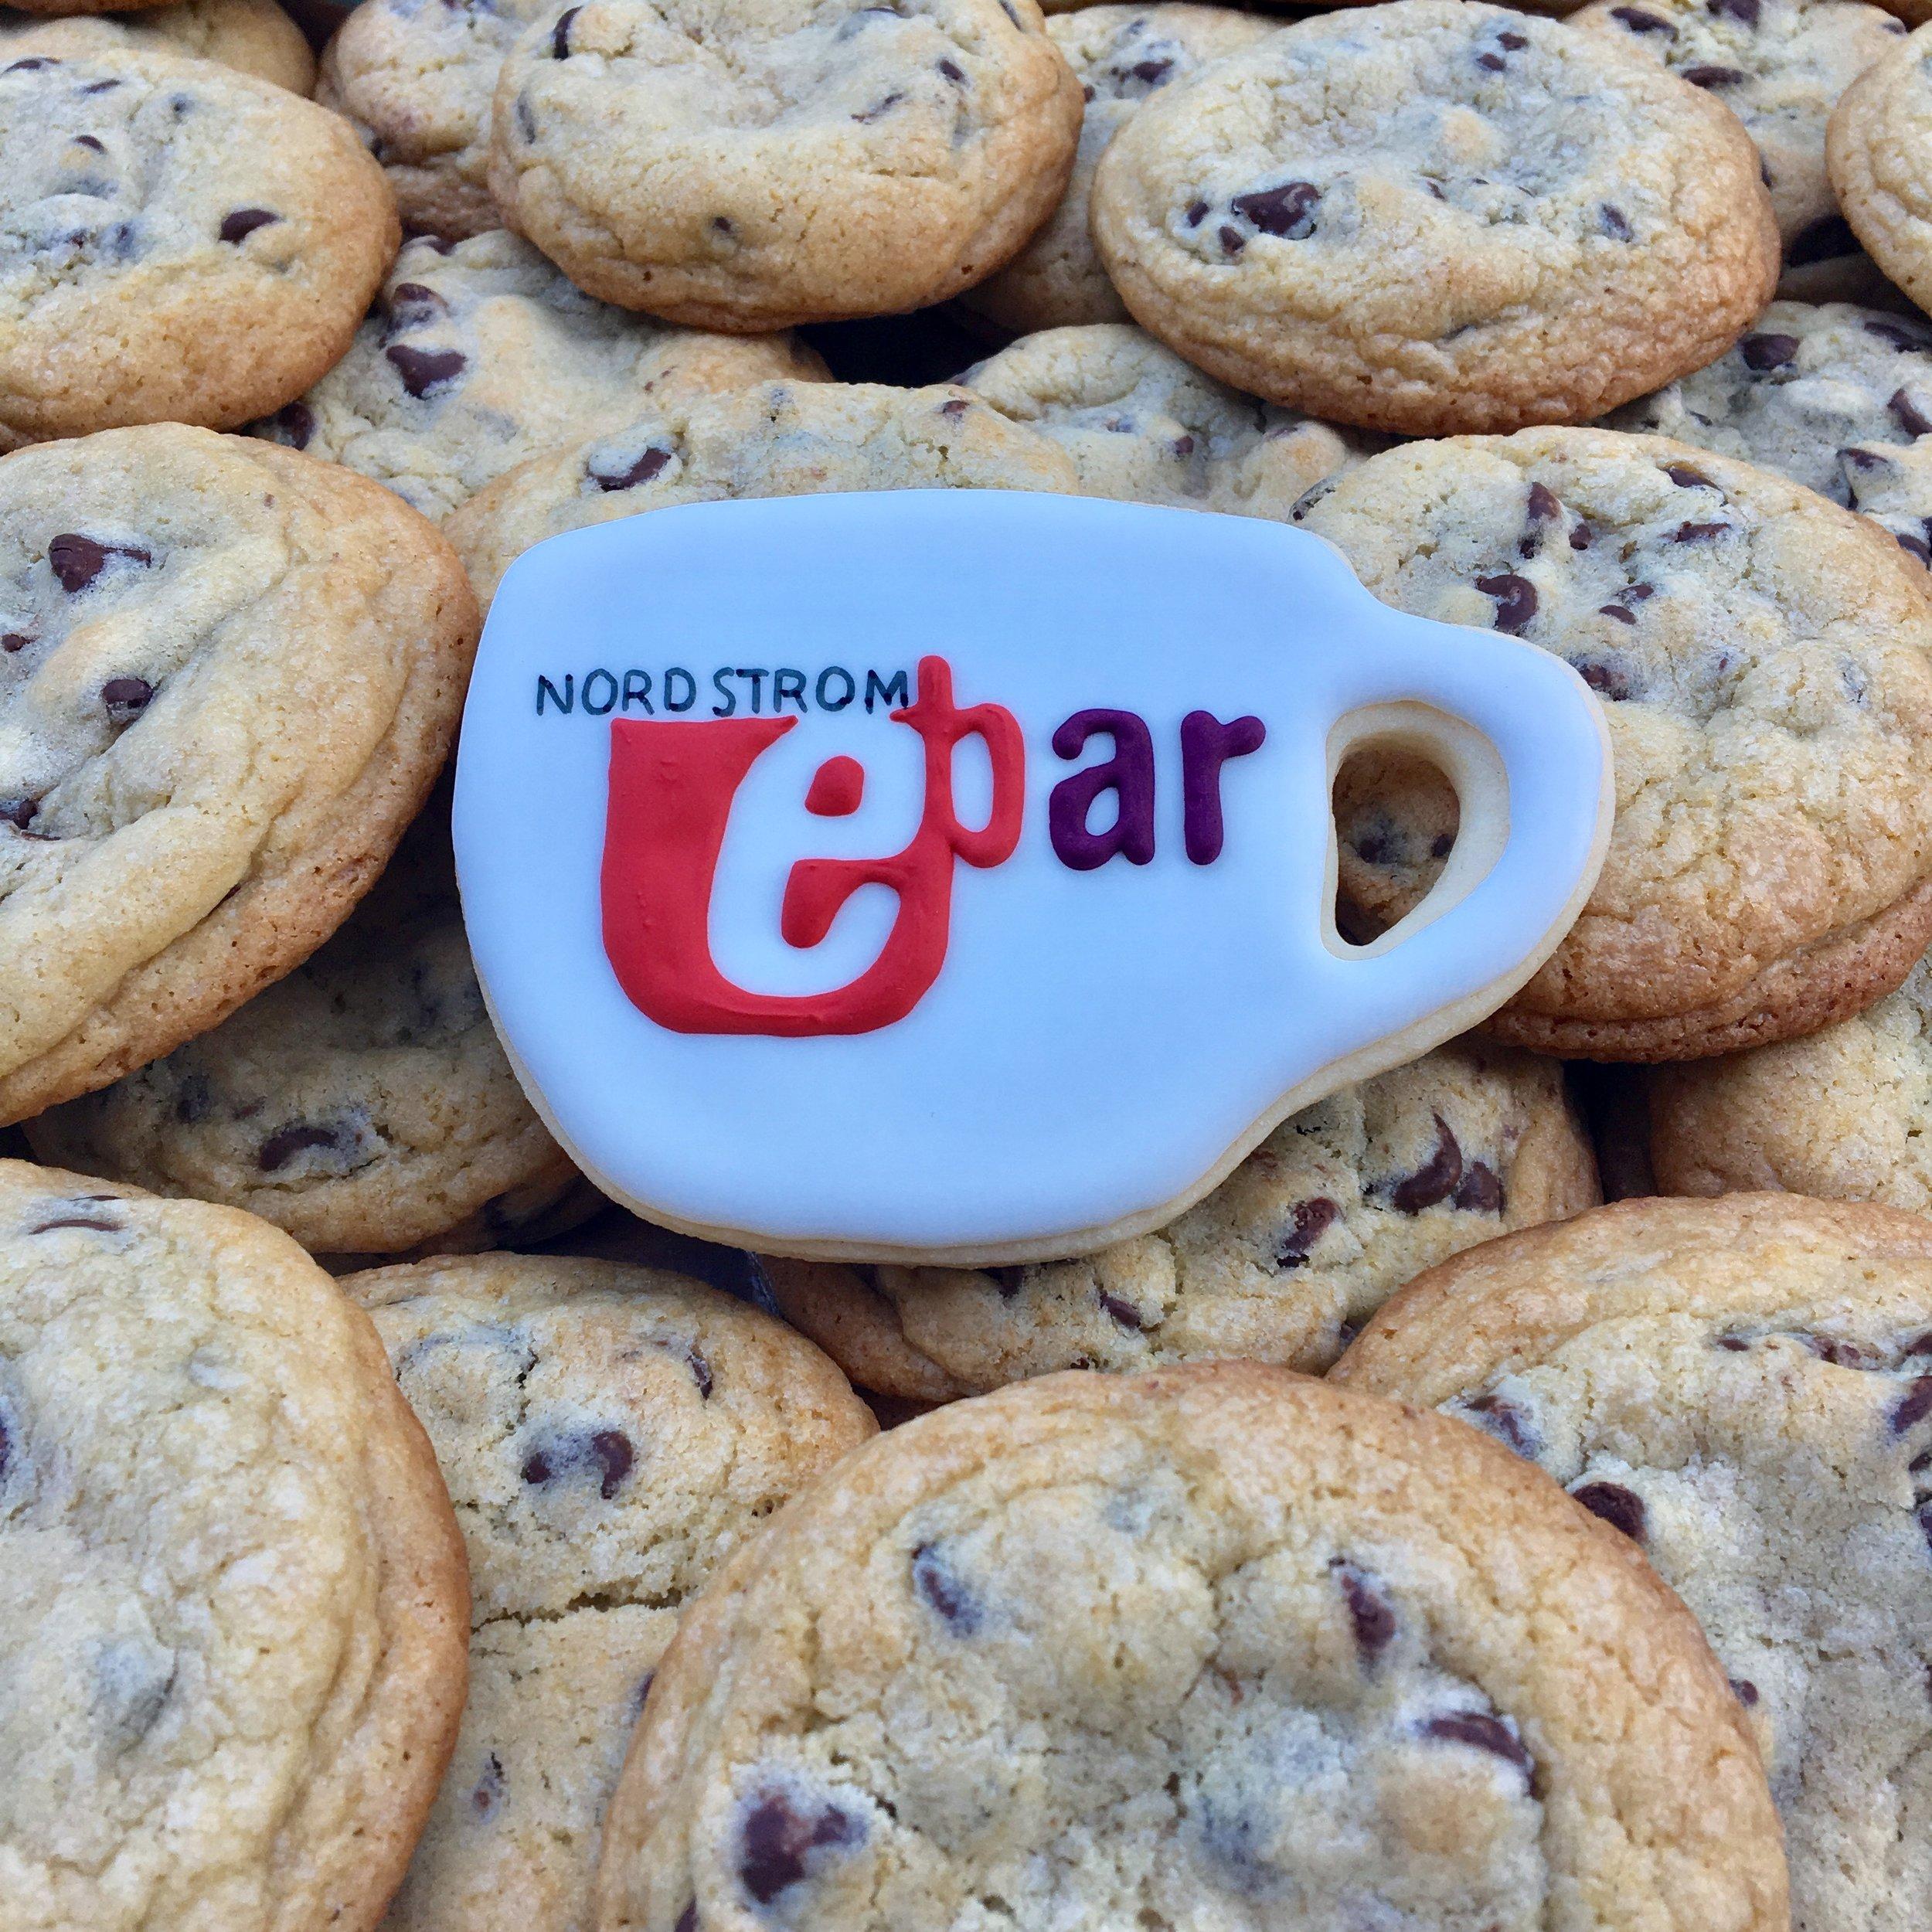 Nordstrom eBar Cookies